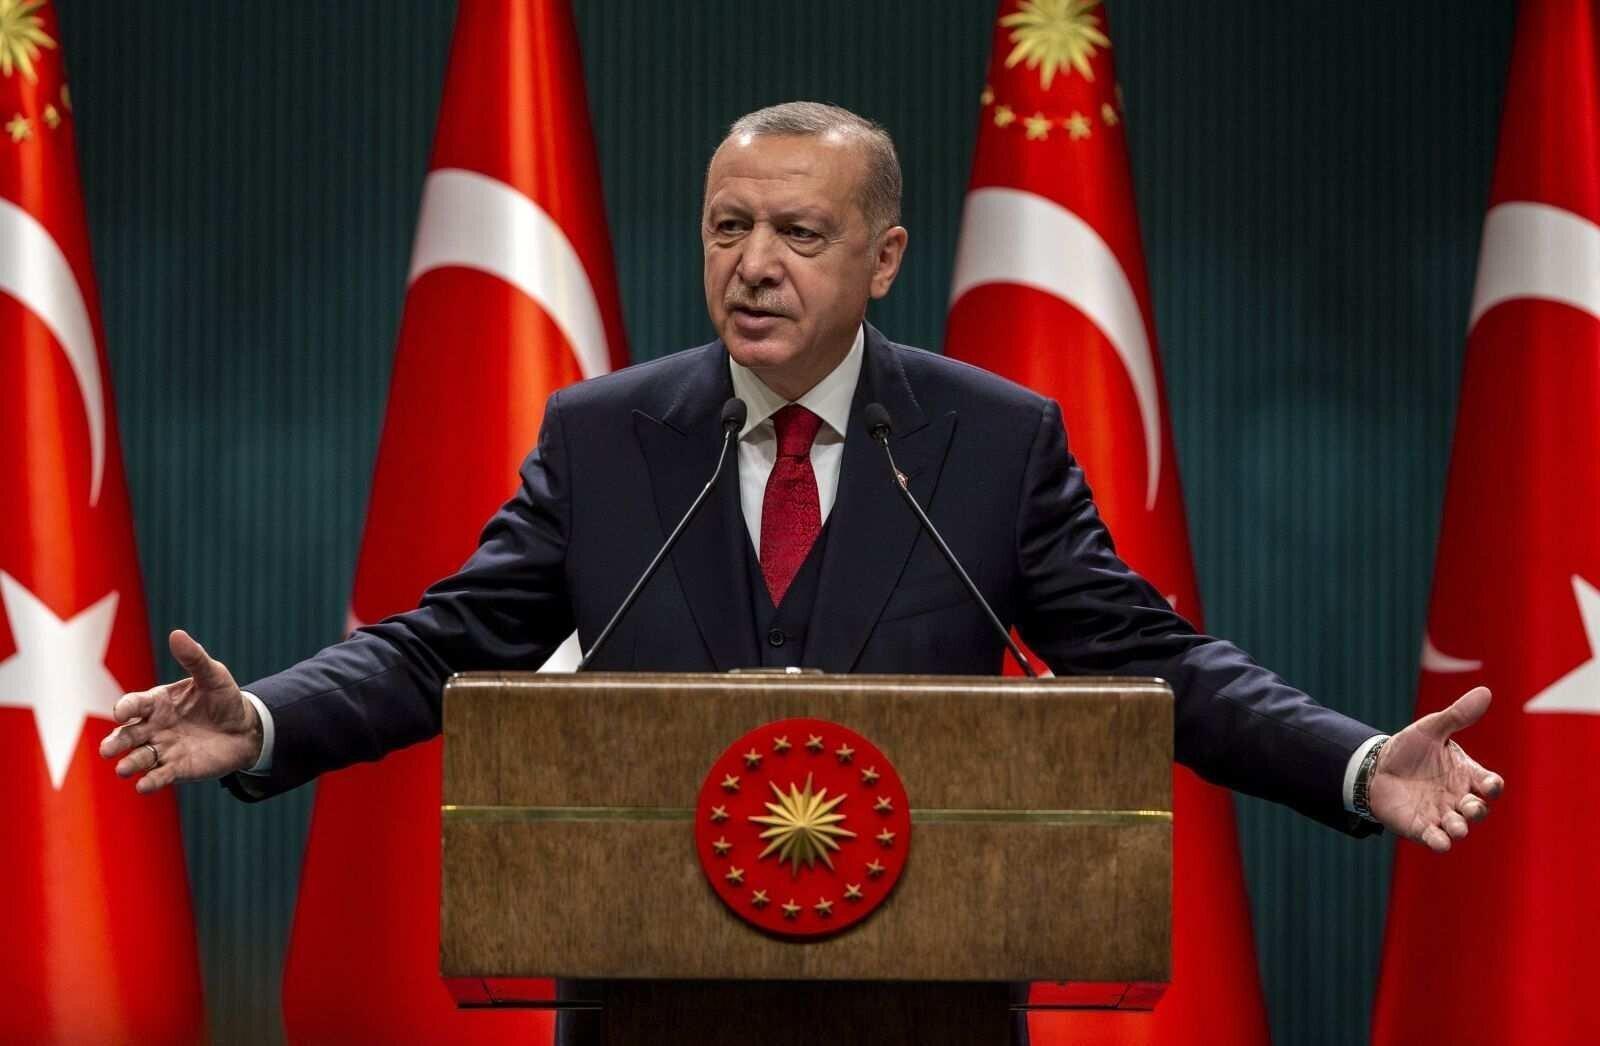 Erdogan Calls on EU for Dialogue